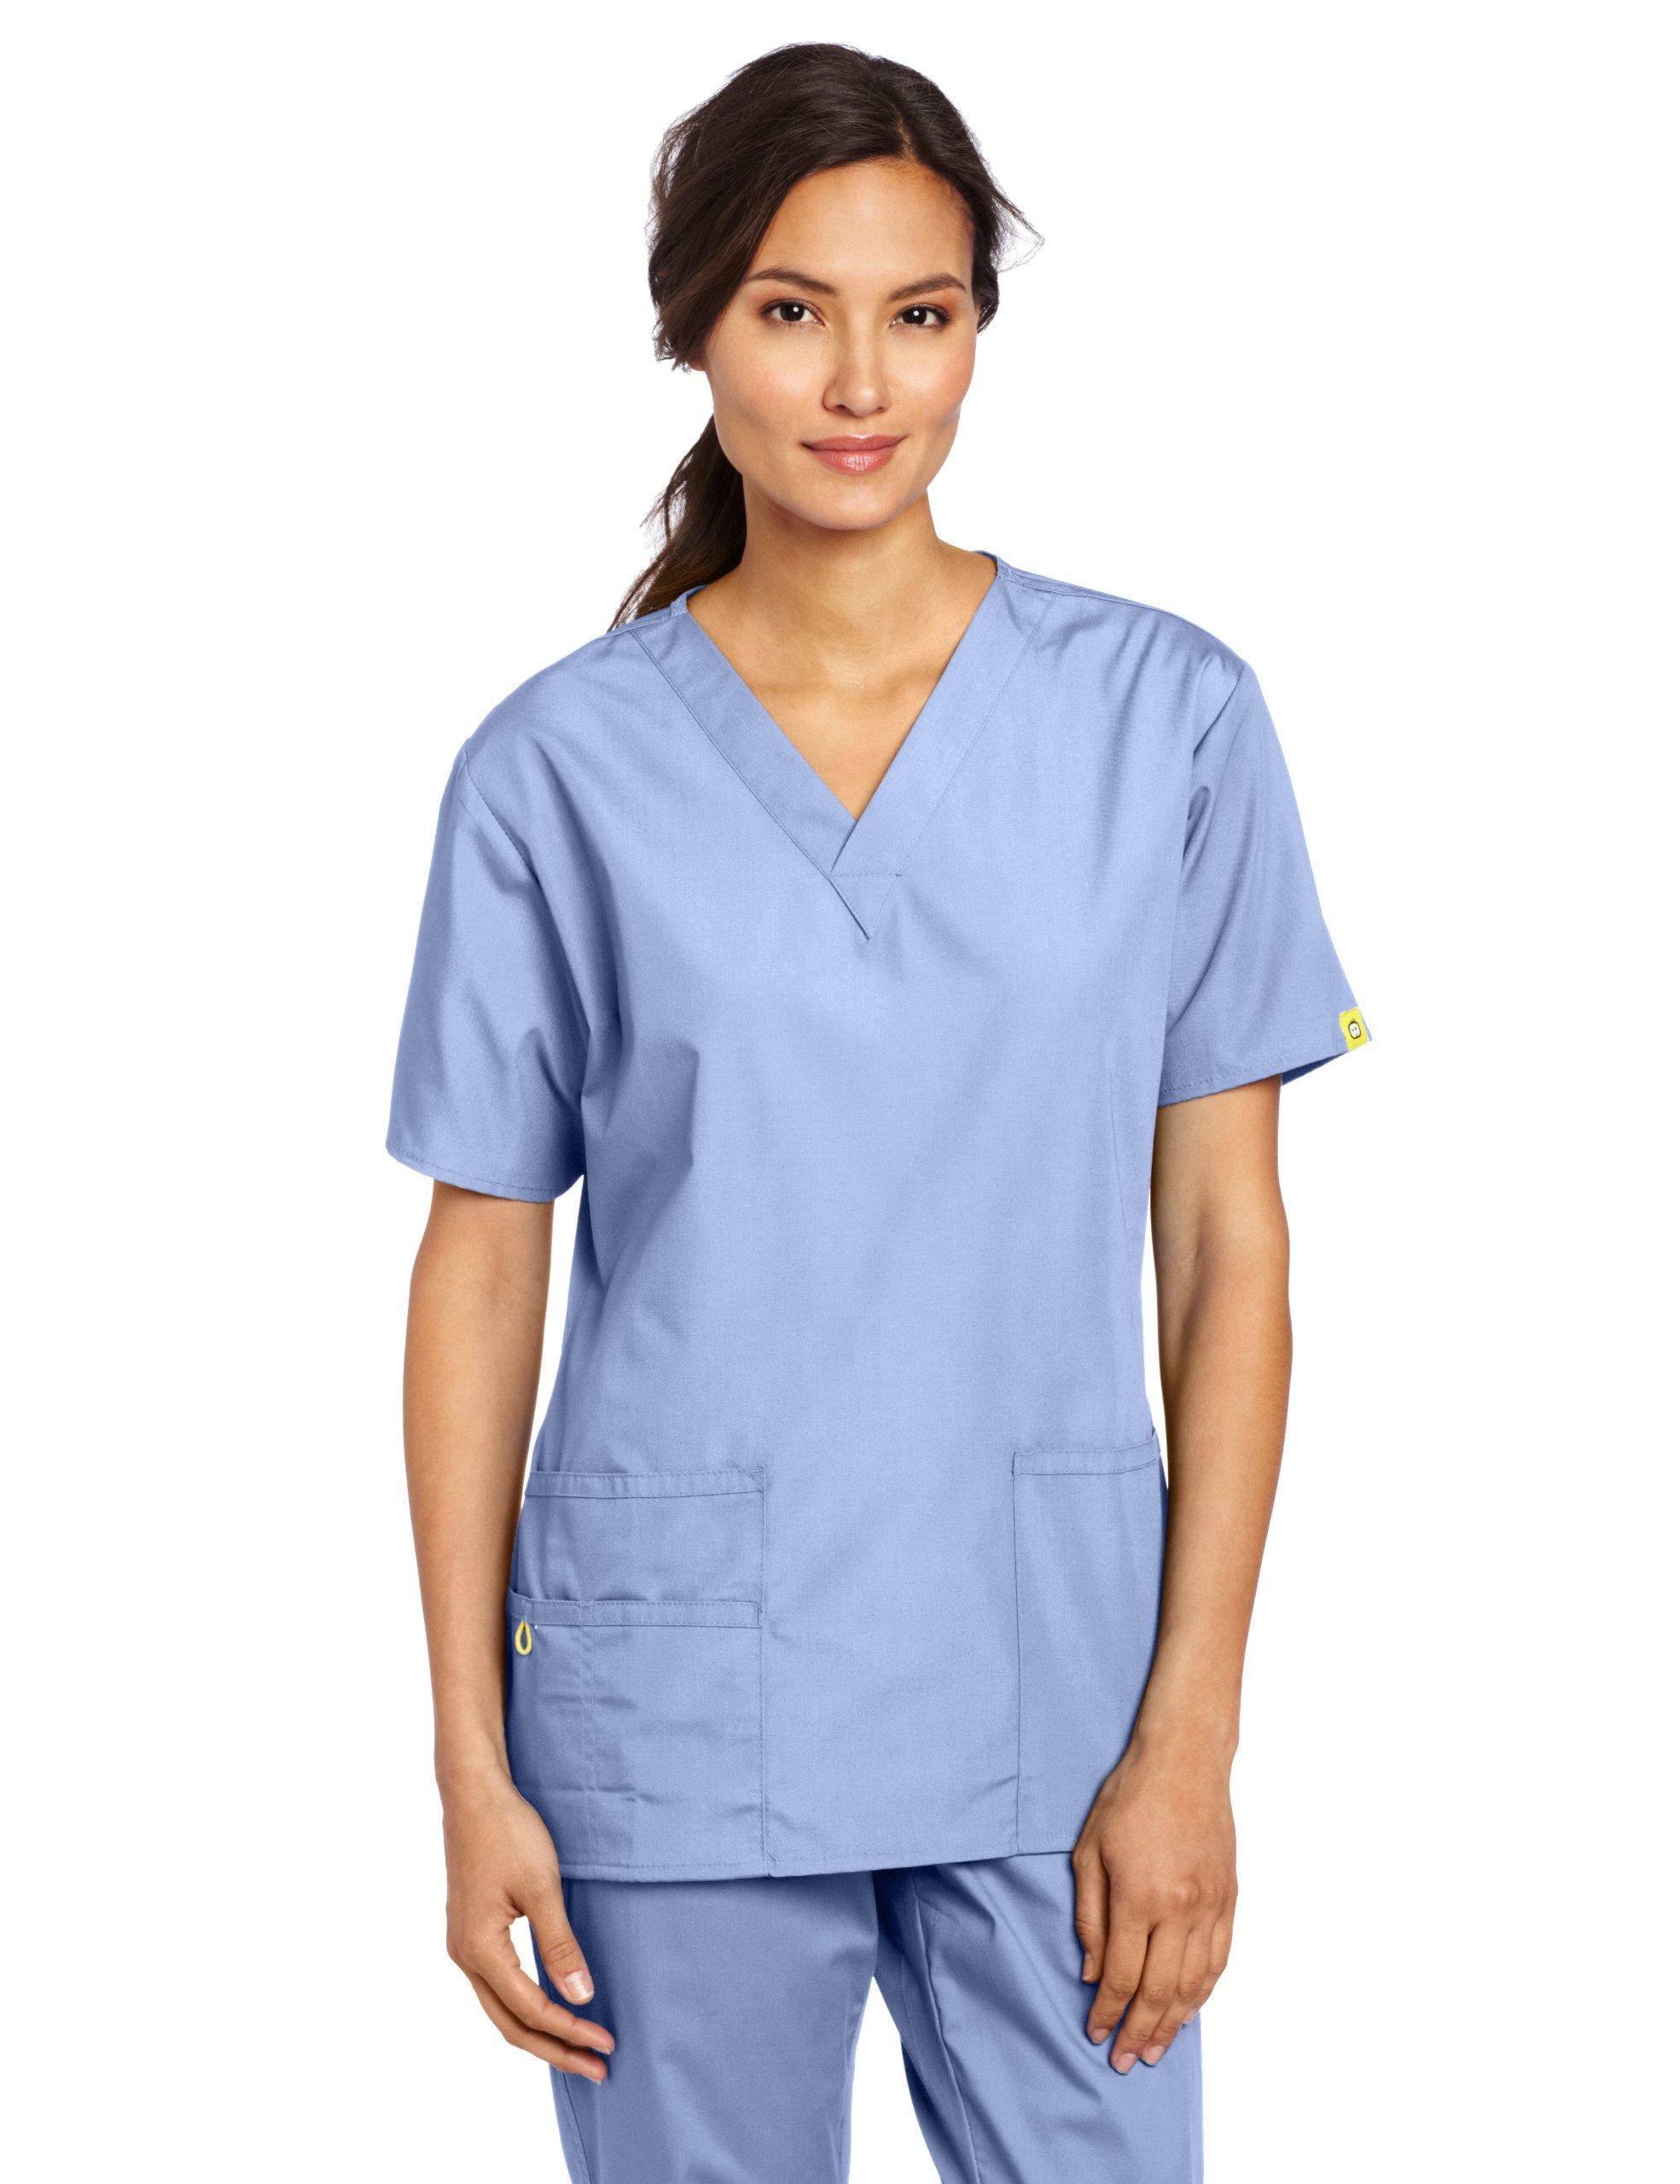 WonderWink Women's Scrubs Bravo 5 Pocket V-Neck Top, Ceil Blue, 2X-Large